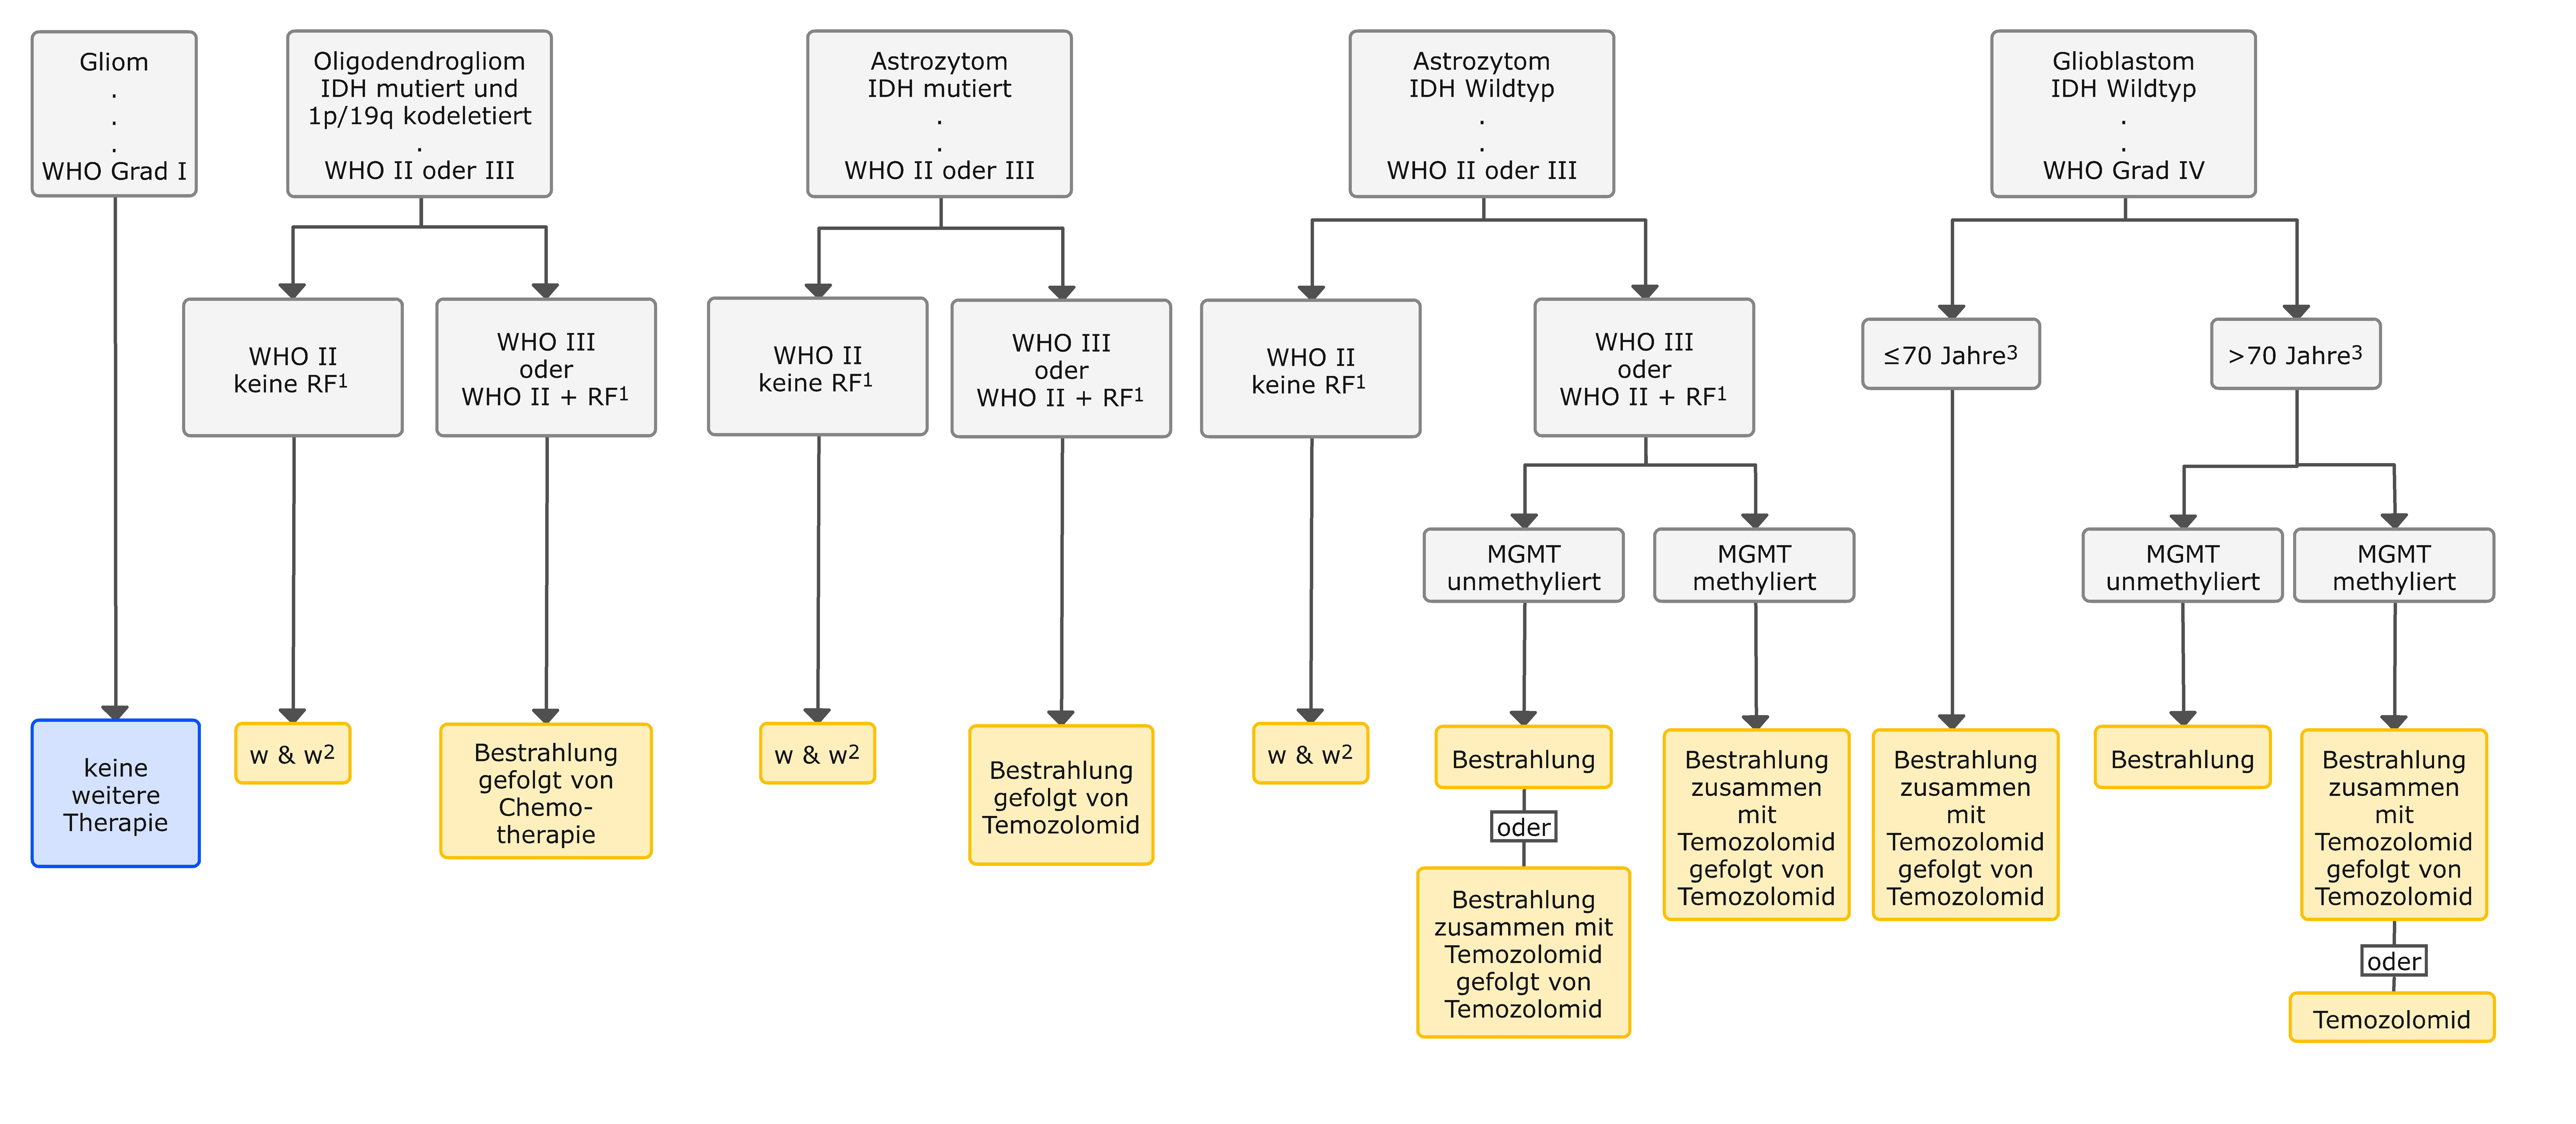 Algorithmus postoperativer Therapien bei Gliome WHO II bis IV